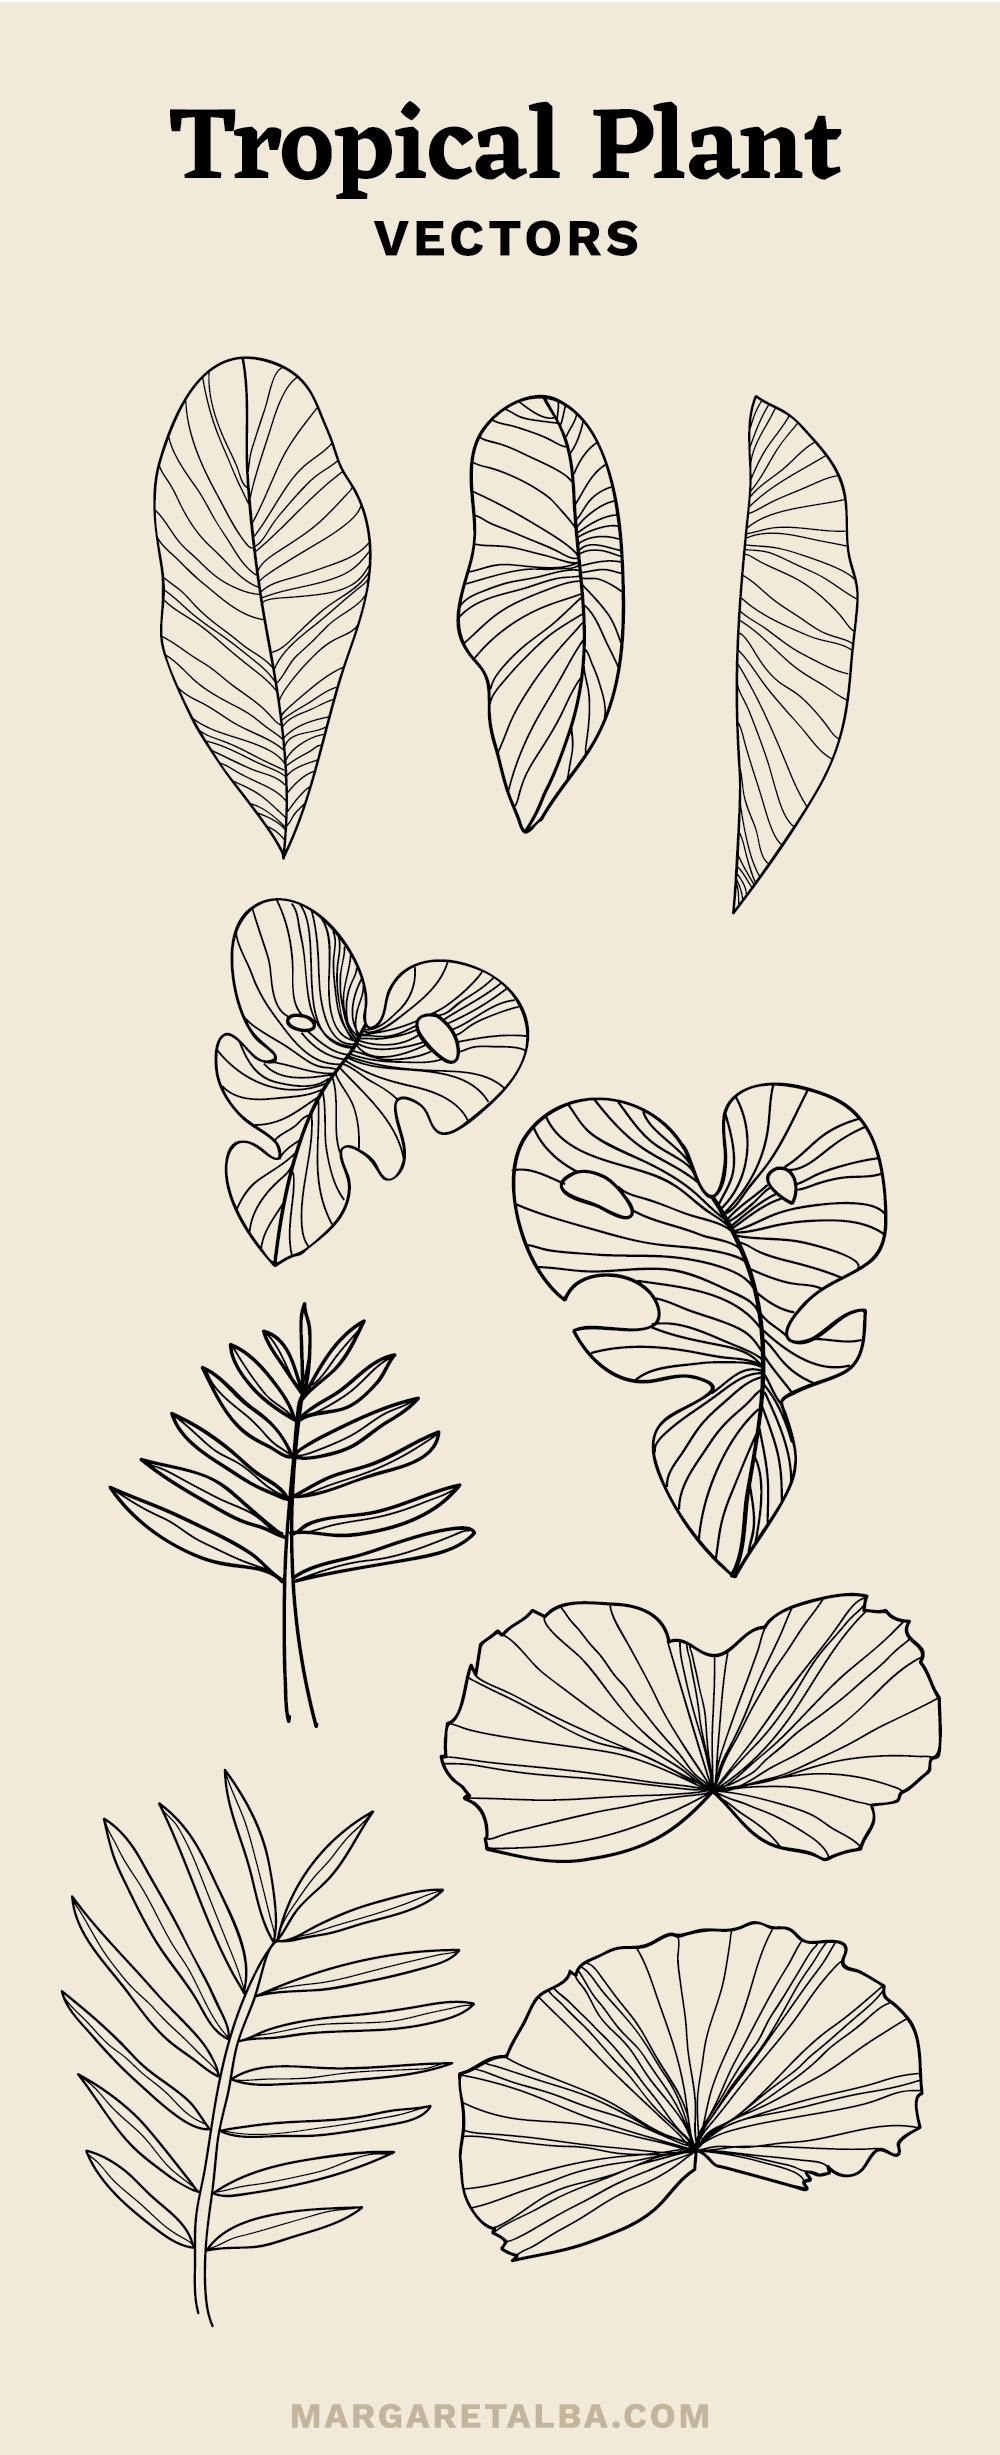 Margaret_Alba_Tropical_Plant_Vector.png